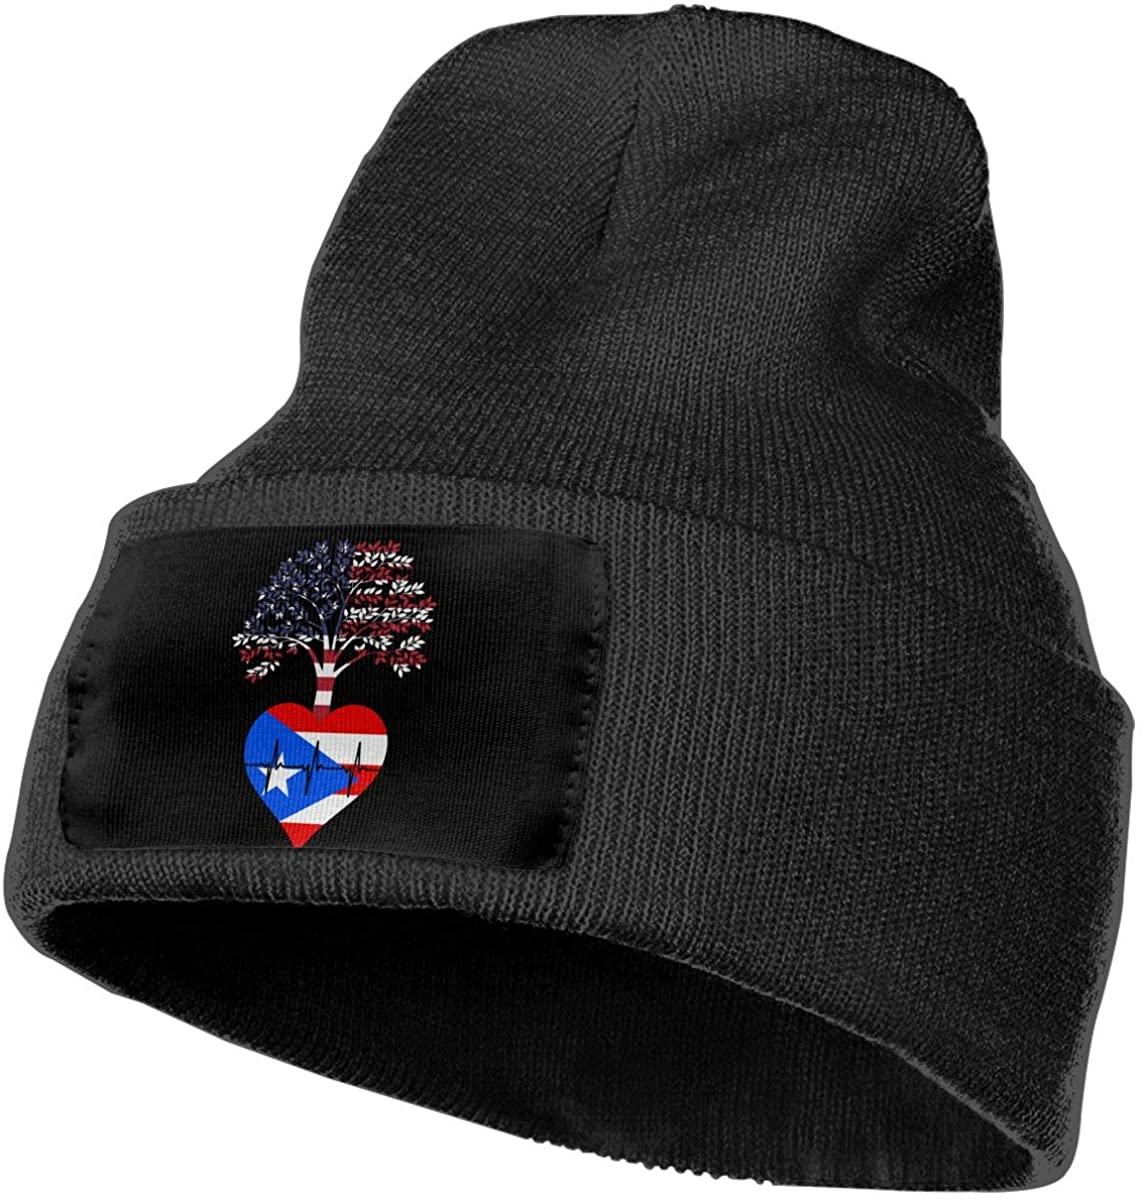 Unisex Beanie Hat Puerto Rico US Root Heartbeat Knit Hat Cap Skull Cap